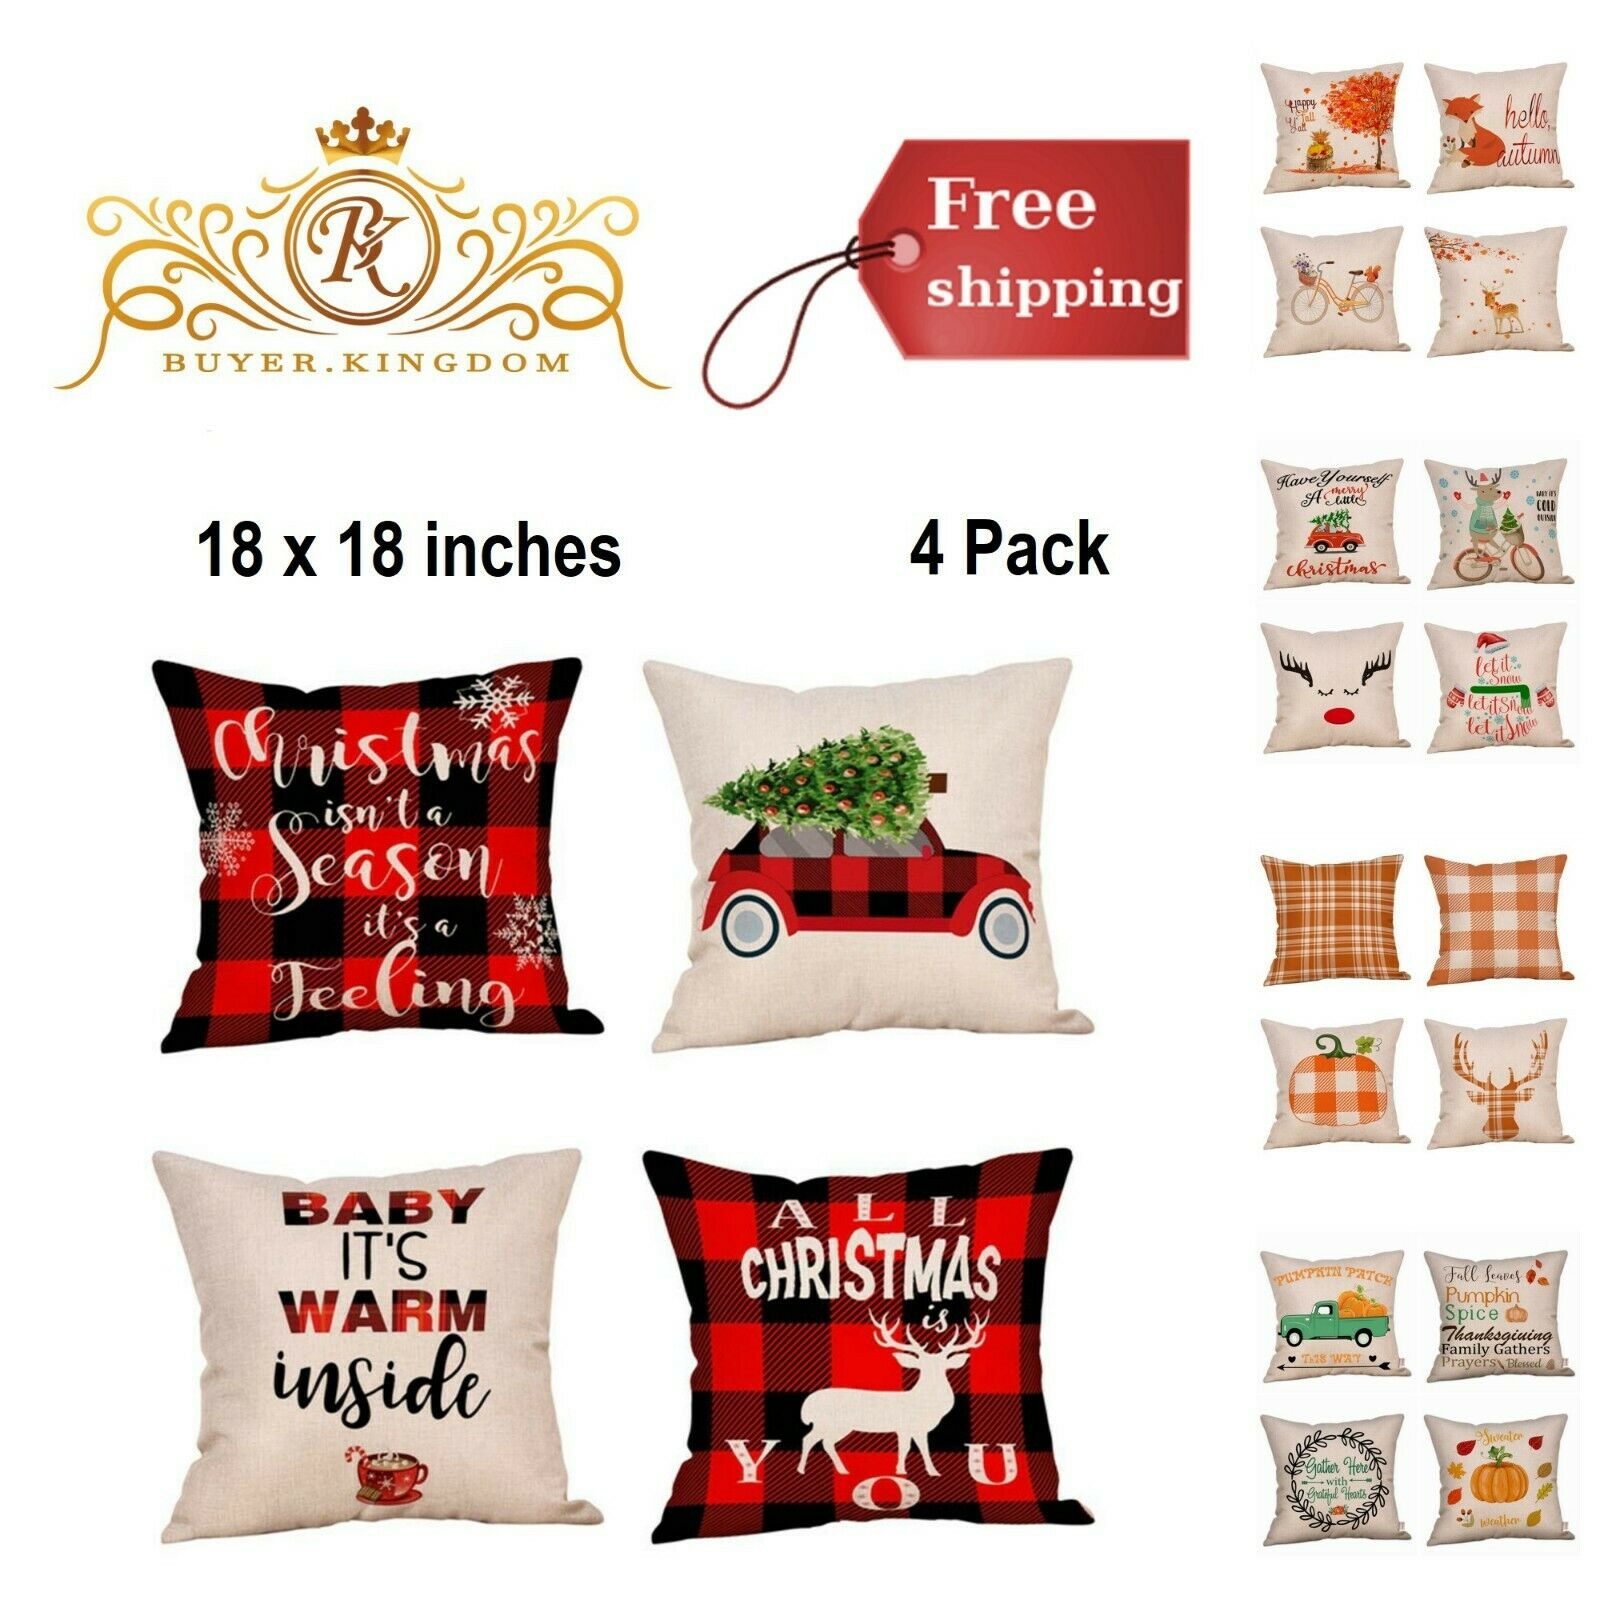 Cushion Pillow Cover Cases Throw Pillowcases Cotton Linen Ch